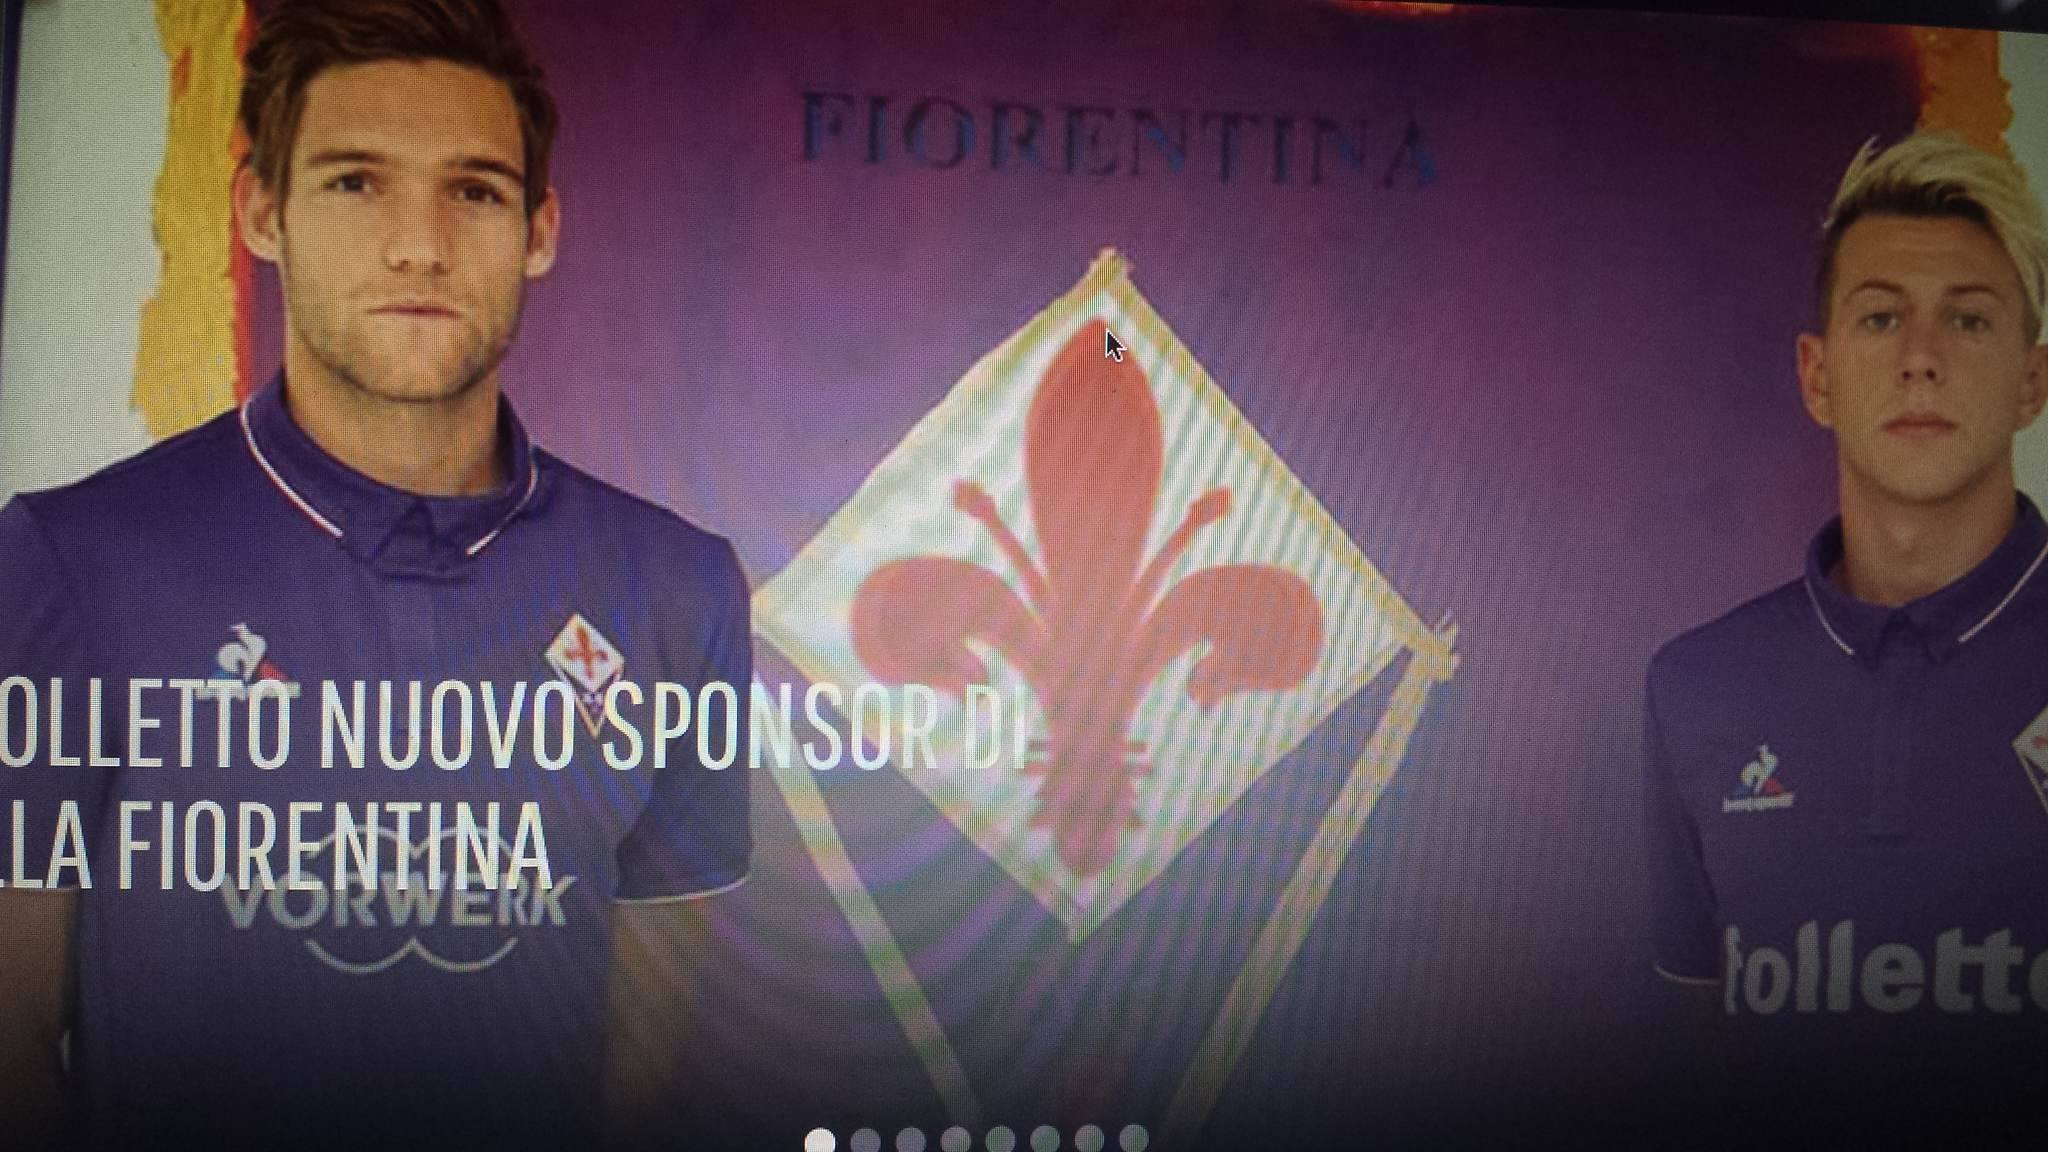 "UFFICIALE: Vorwerk Folletto sponsor. Cognigni: ""Crescita internazionale"""